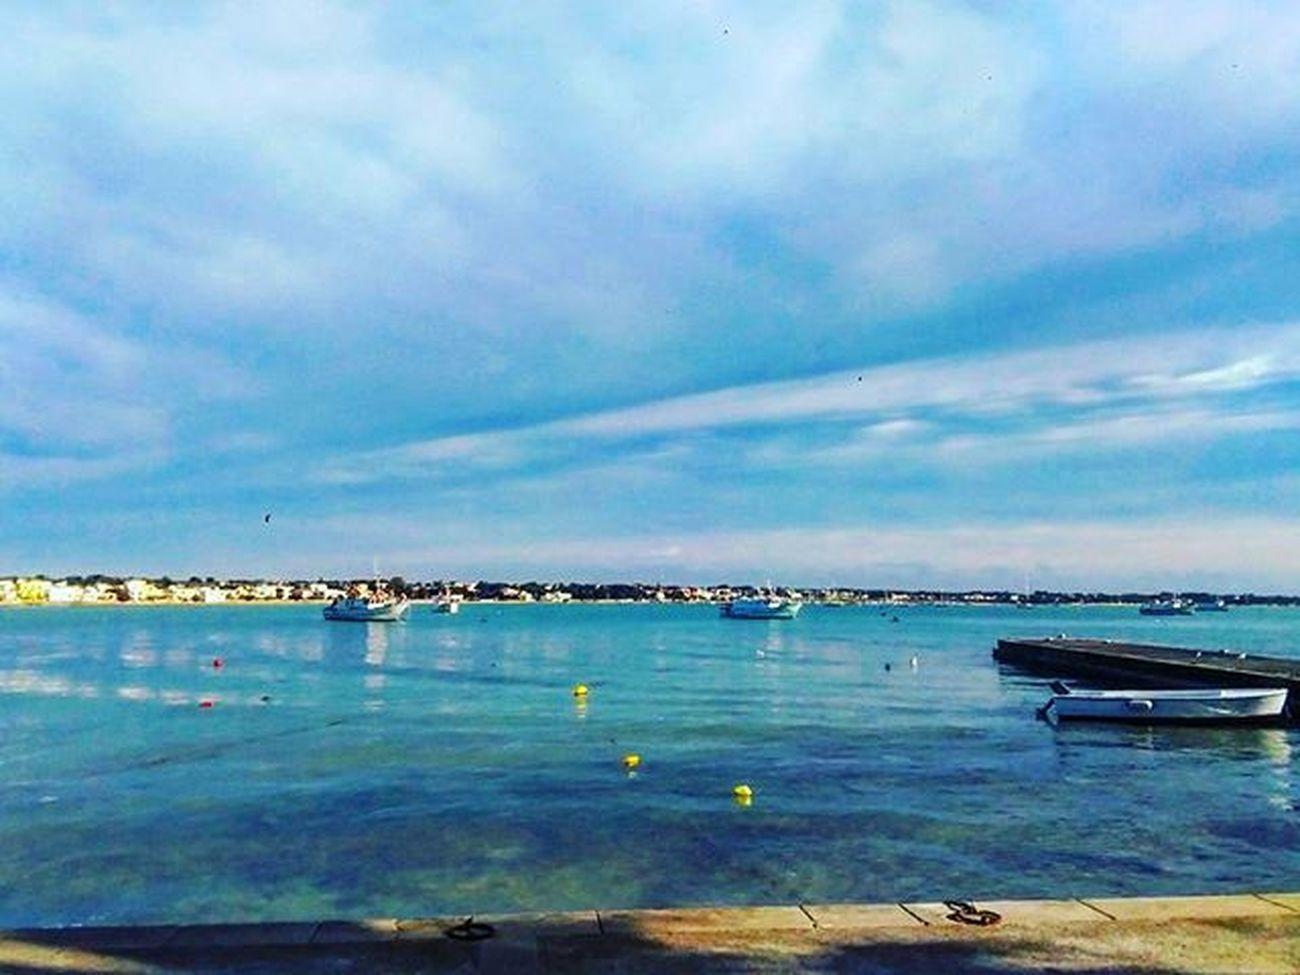 Beautiful Sea Sealife Sealovers Live Life Lifestyle Italianstyle Italy Salento Salentostyle Portocesareo Wonderful Colorful Colours Seacolours Landscape Picoftheday Picoftoday Januaryphotochallenge